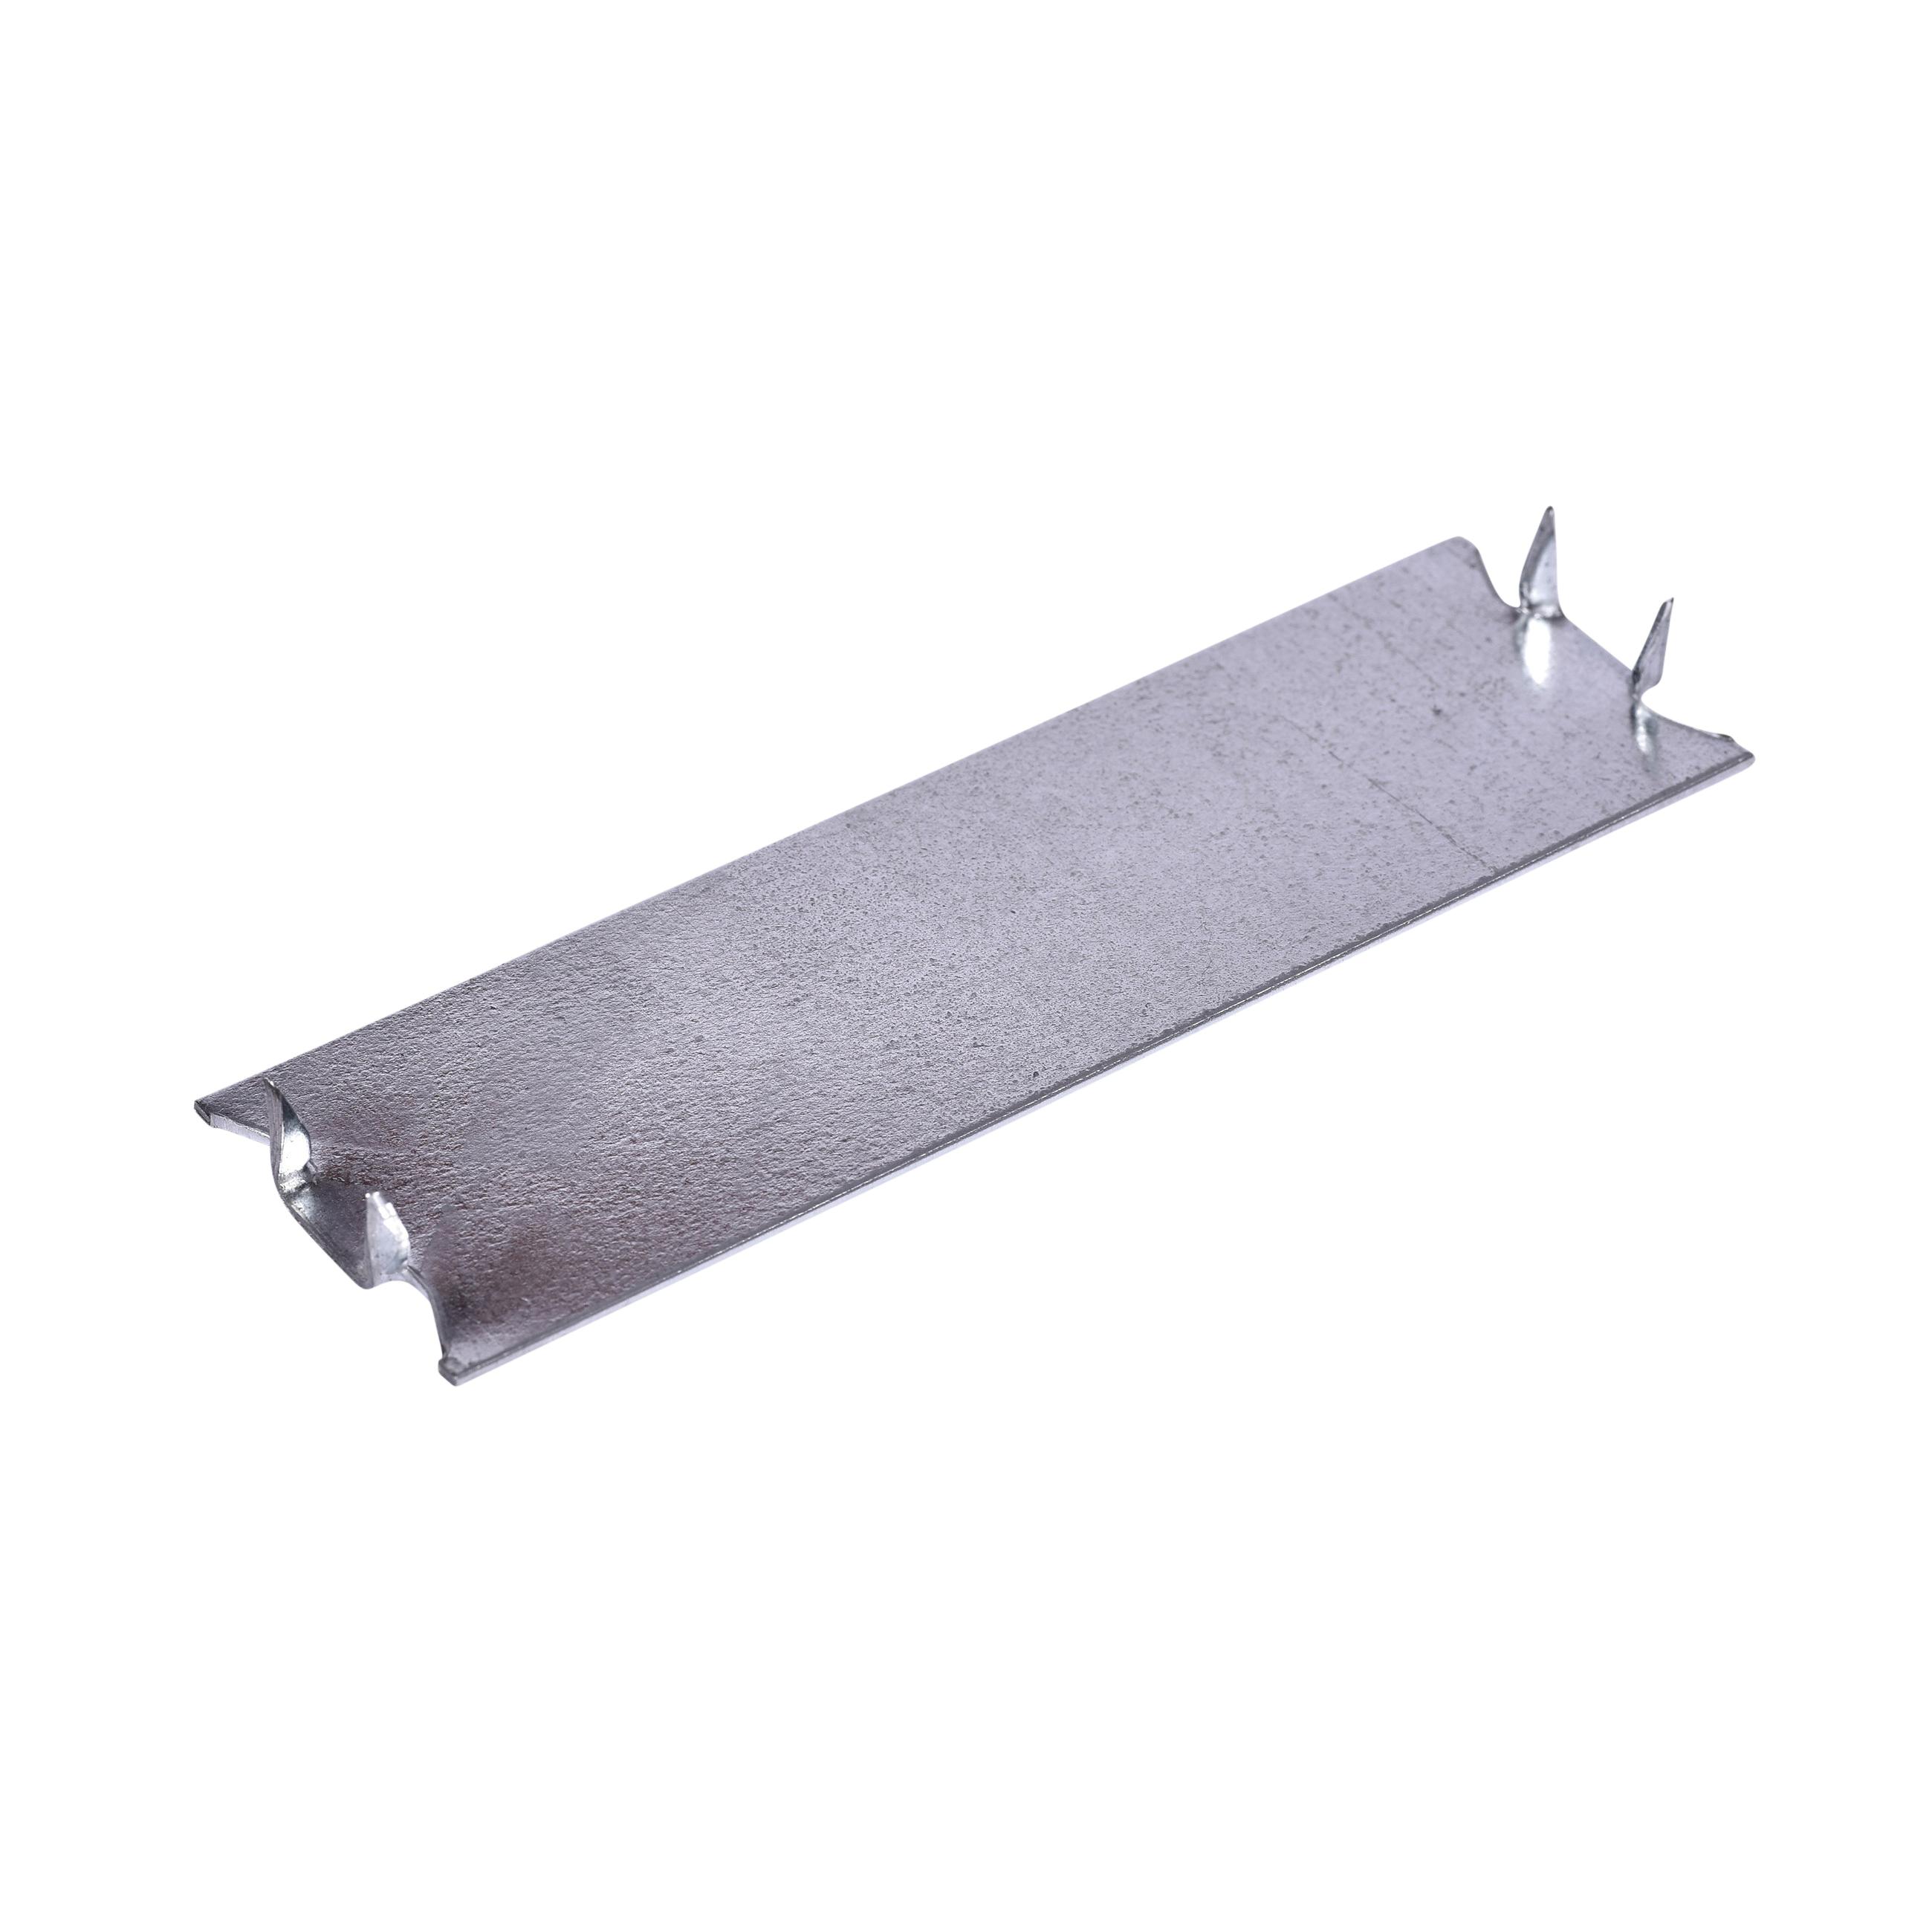 Oatey® 33931 Self-Nailing Stud Guard, 5 in L x 1-1/2 in W, Steel, Galvanized, Domestic